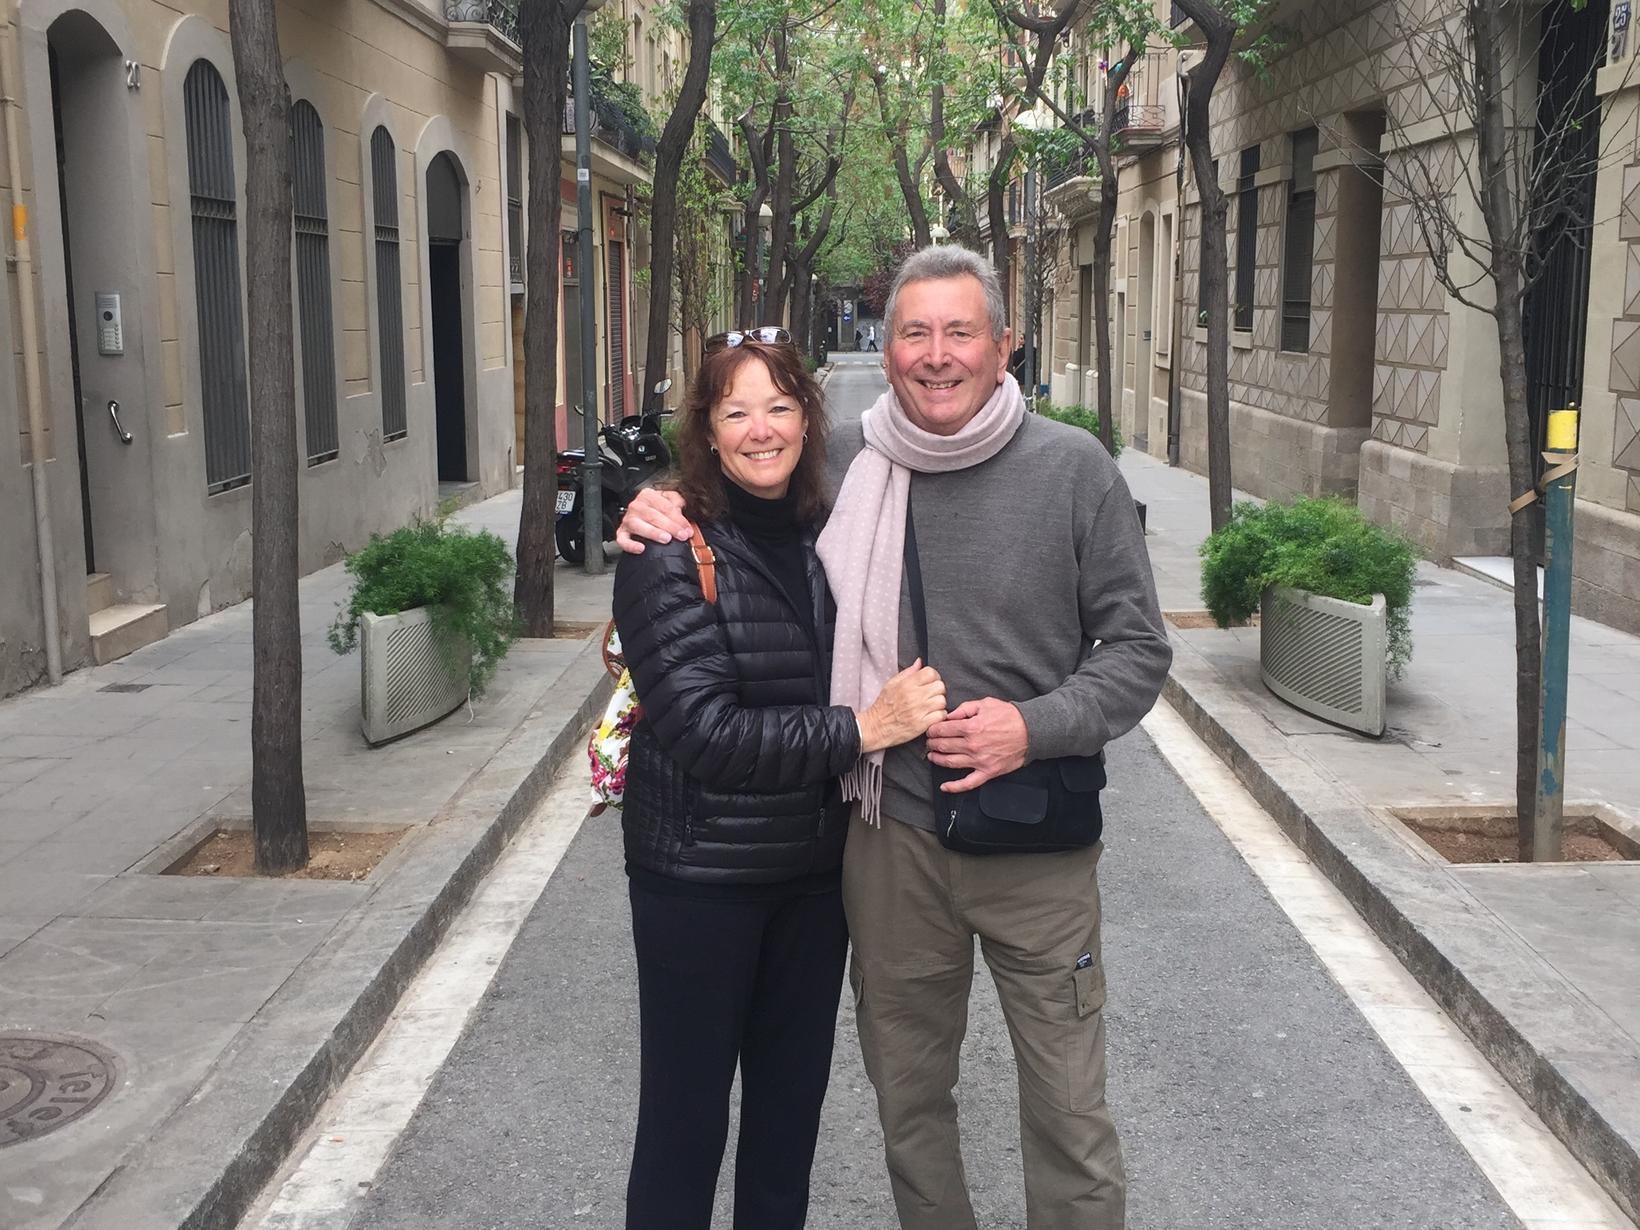 Paul & Joy from Melbourne, Victoria, Australia